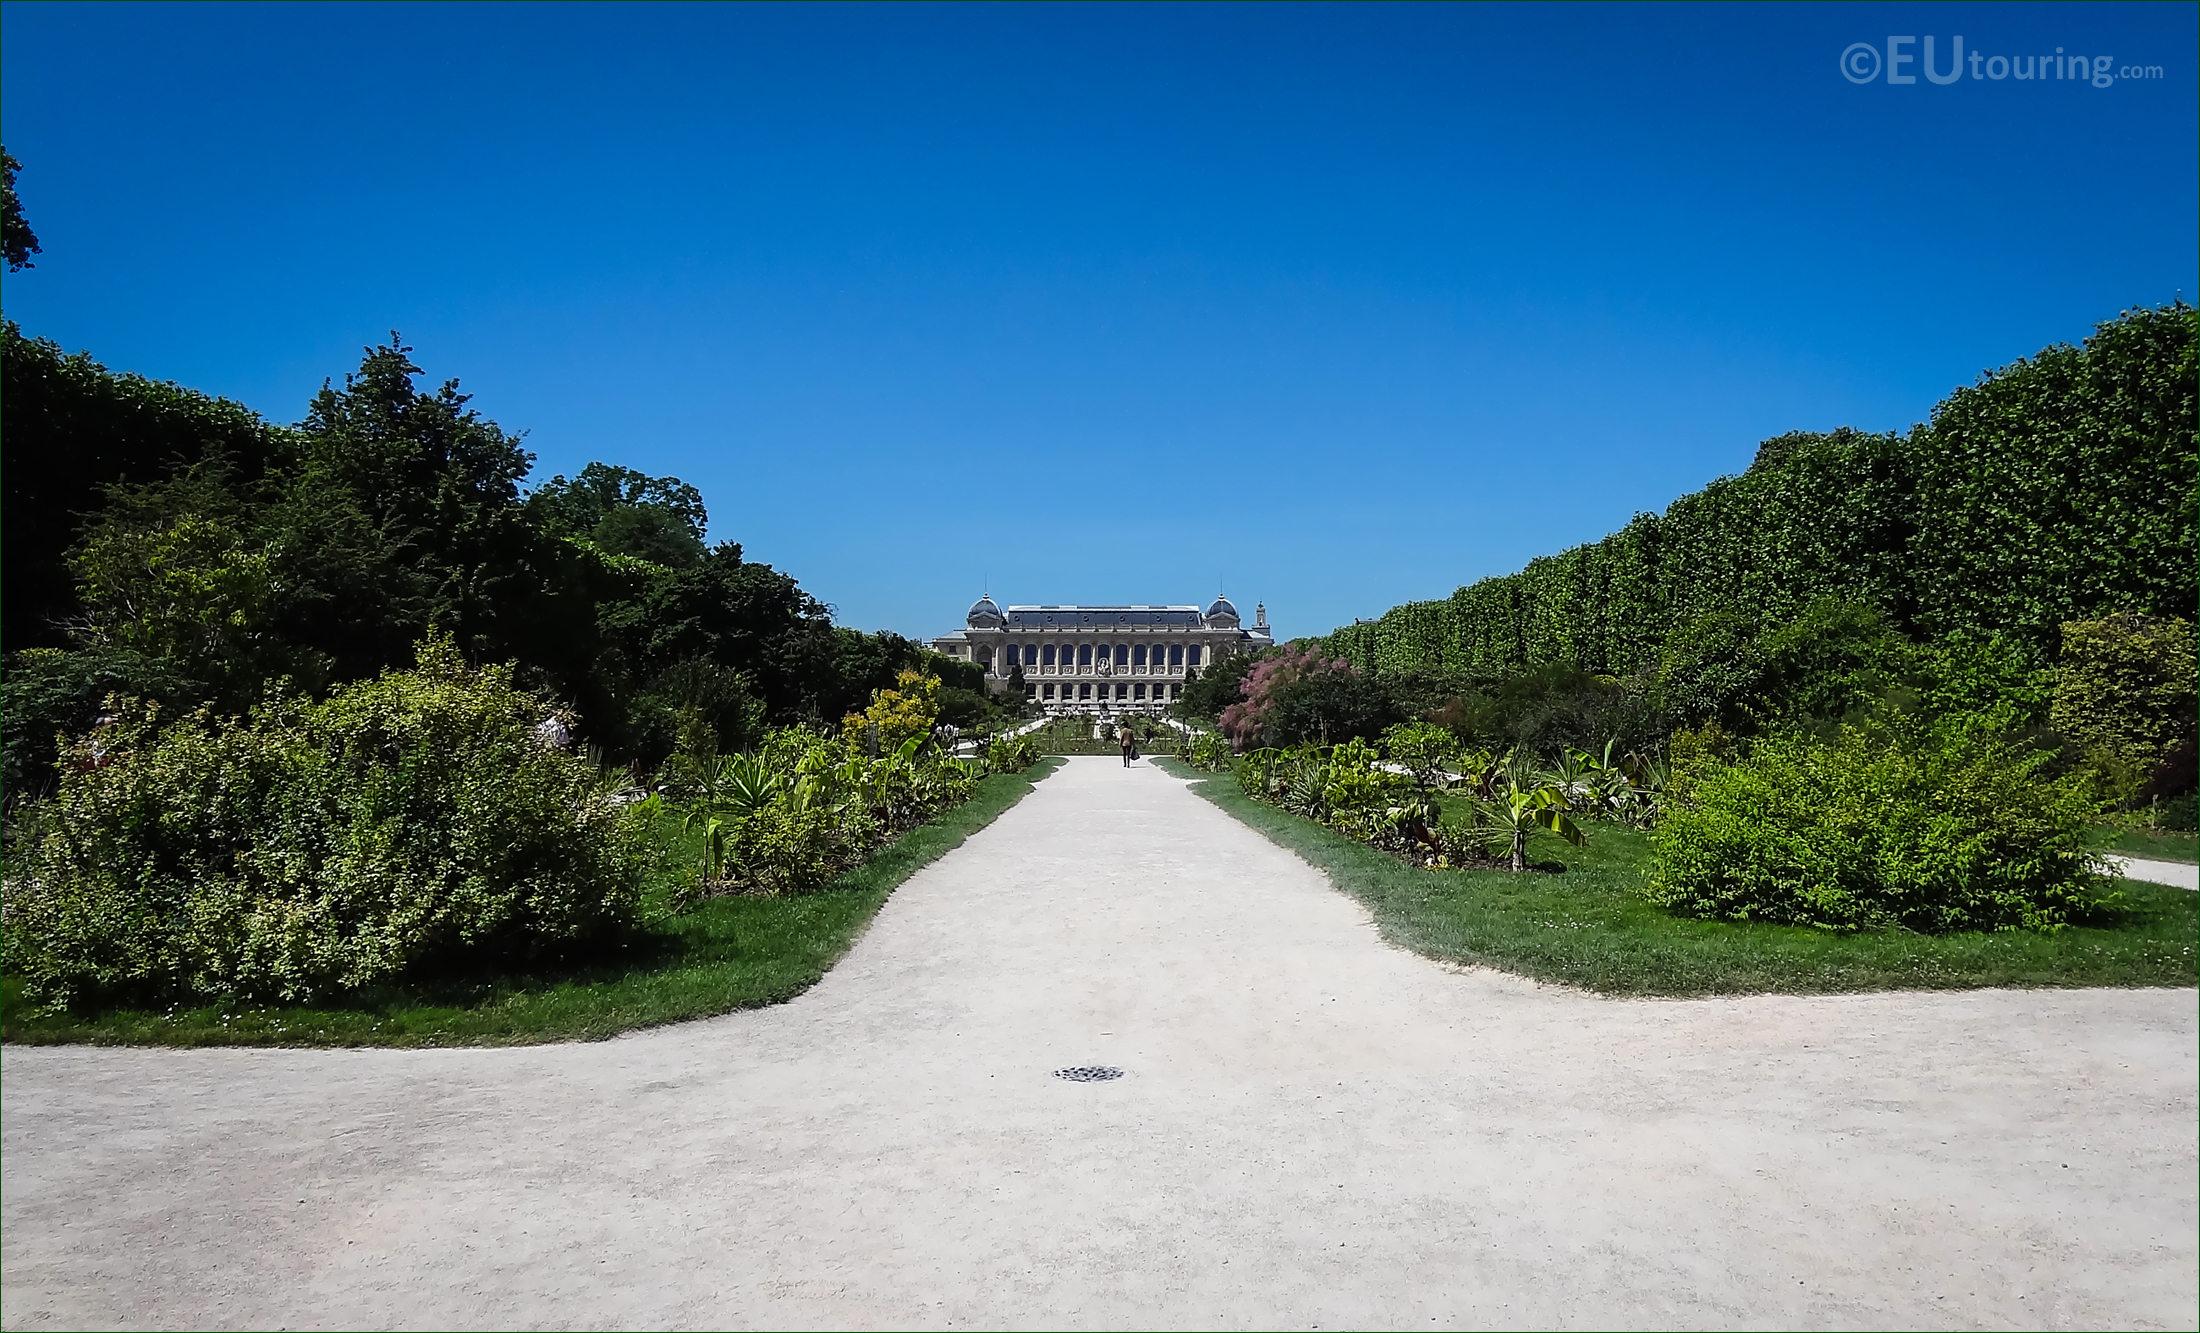 Hd photographs of jardin des plantes in paris france for Allee de jardin